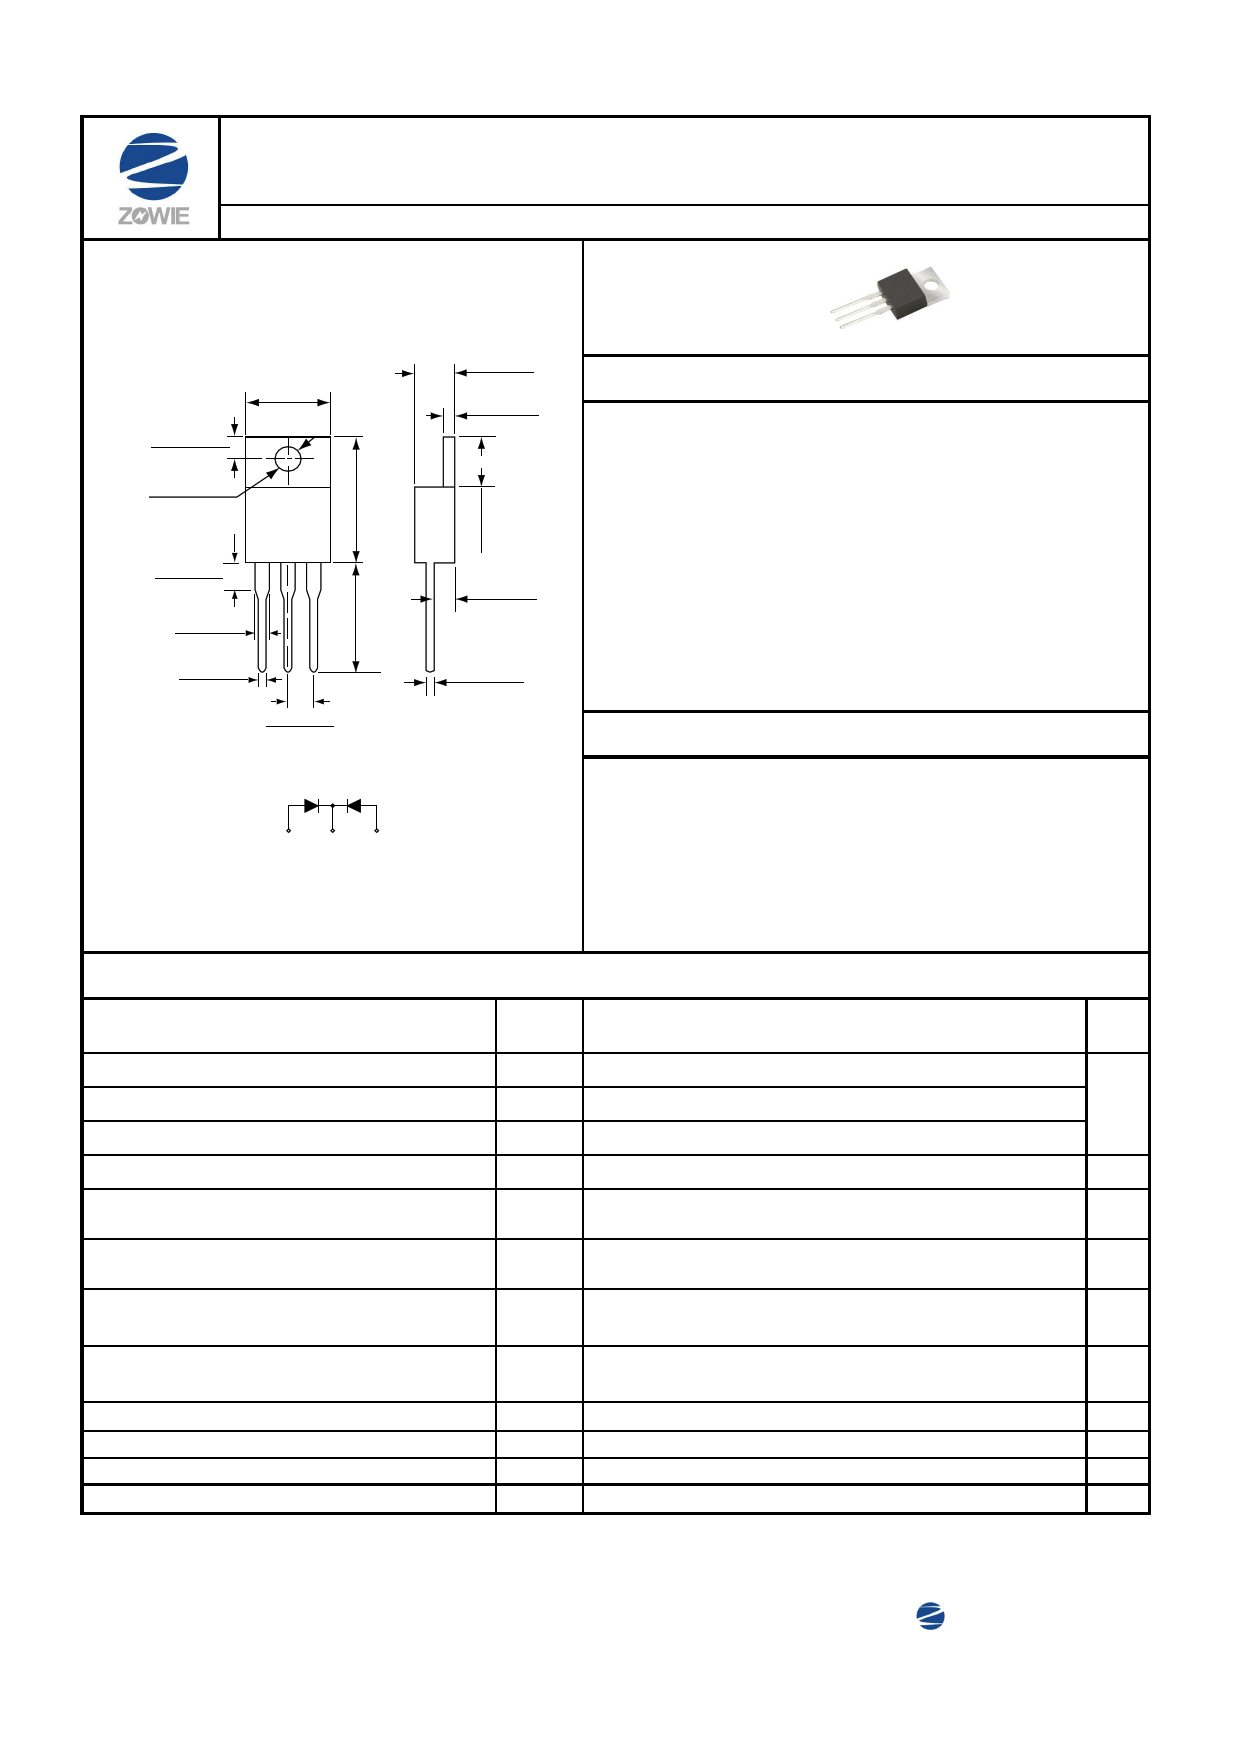 MBR10200CTSH Datasheet, MBR10200CTSH PDF,ピン配置, 機能